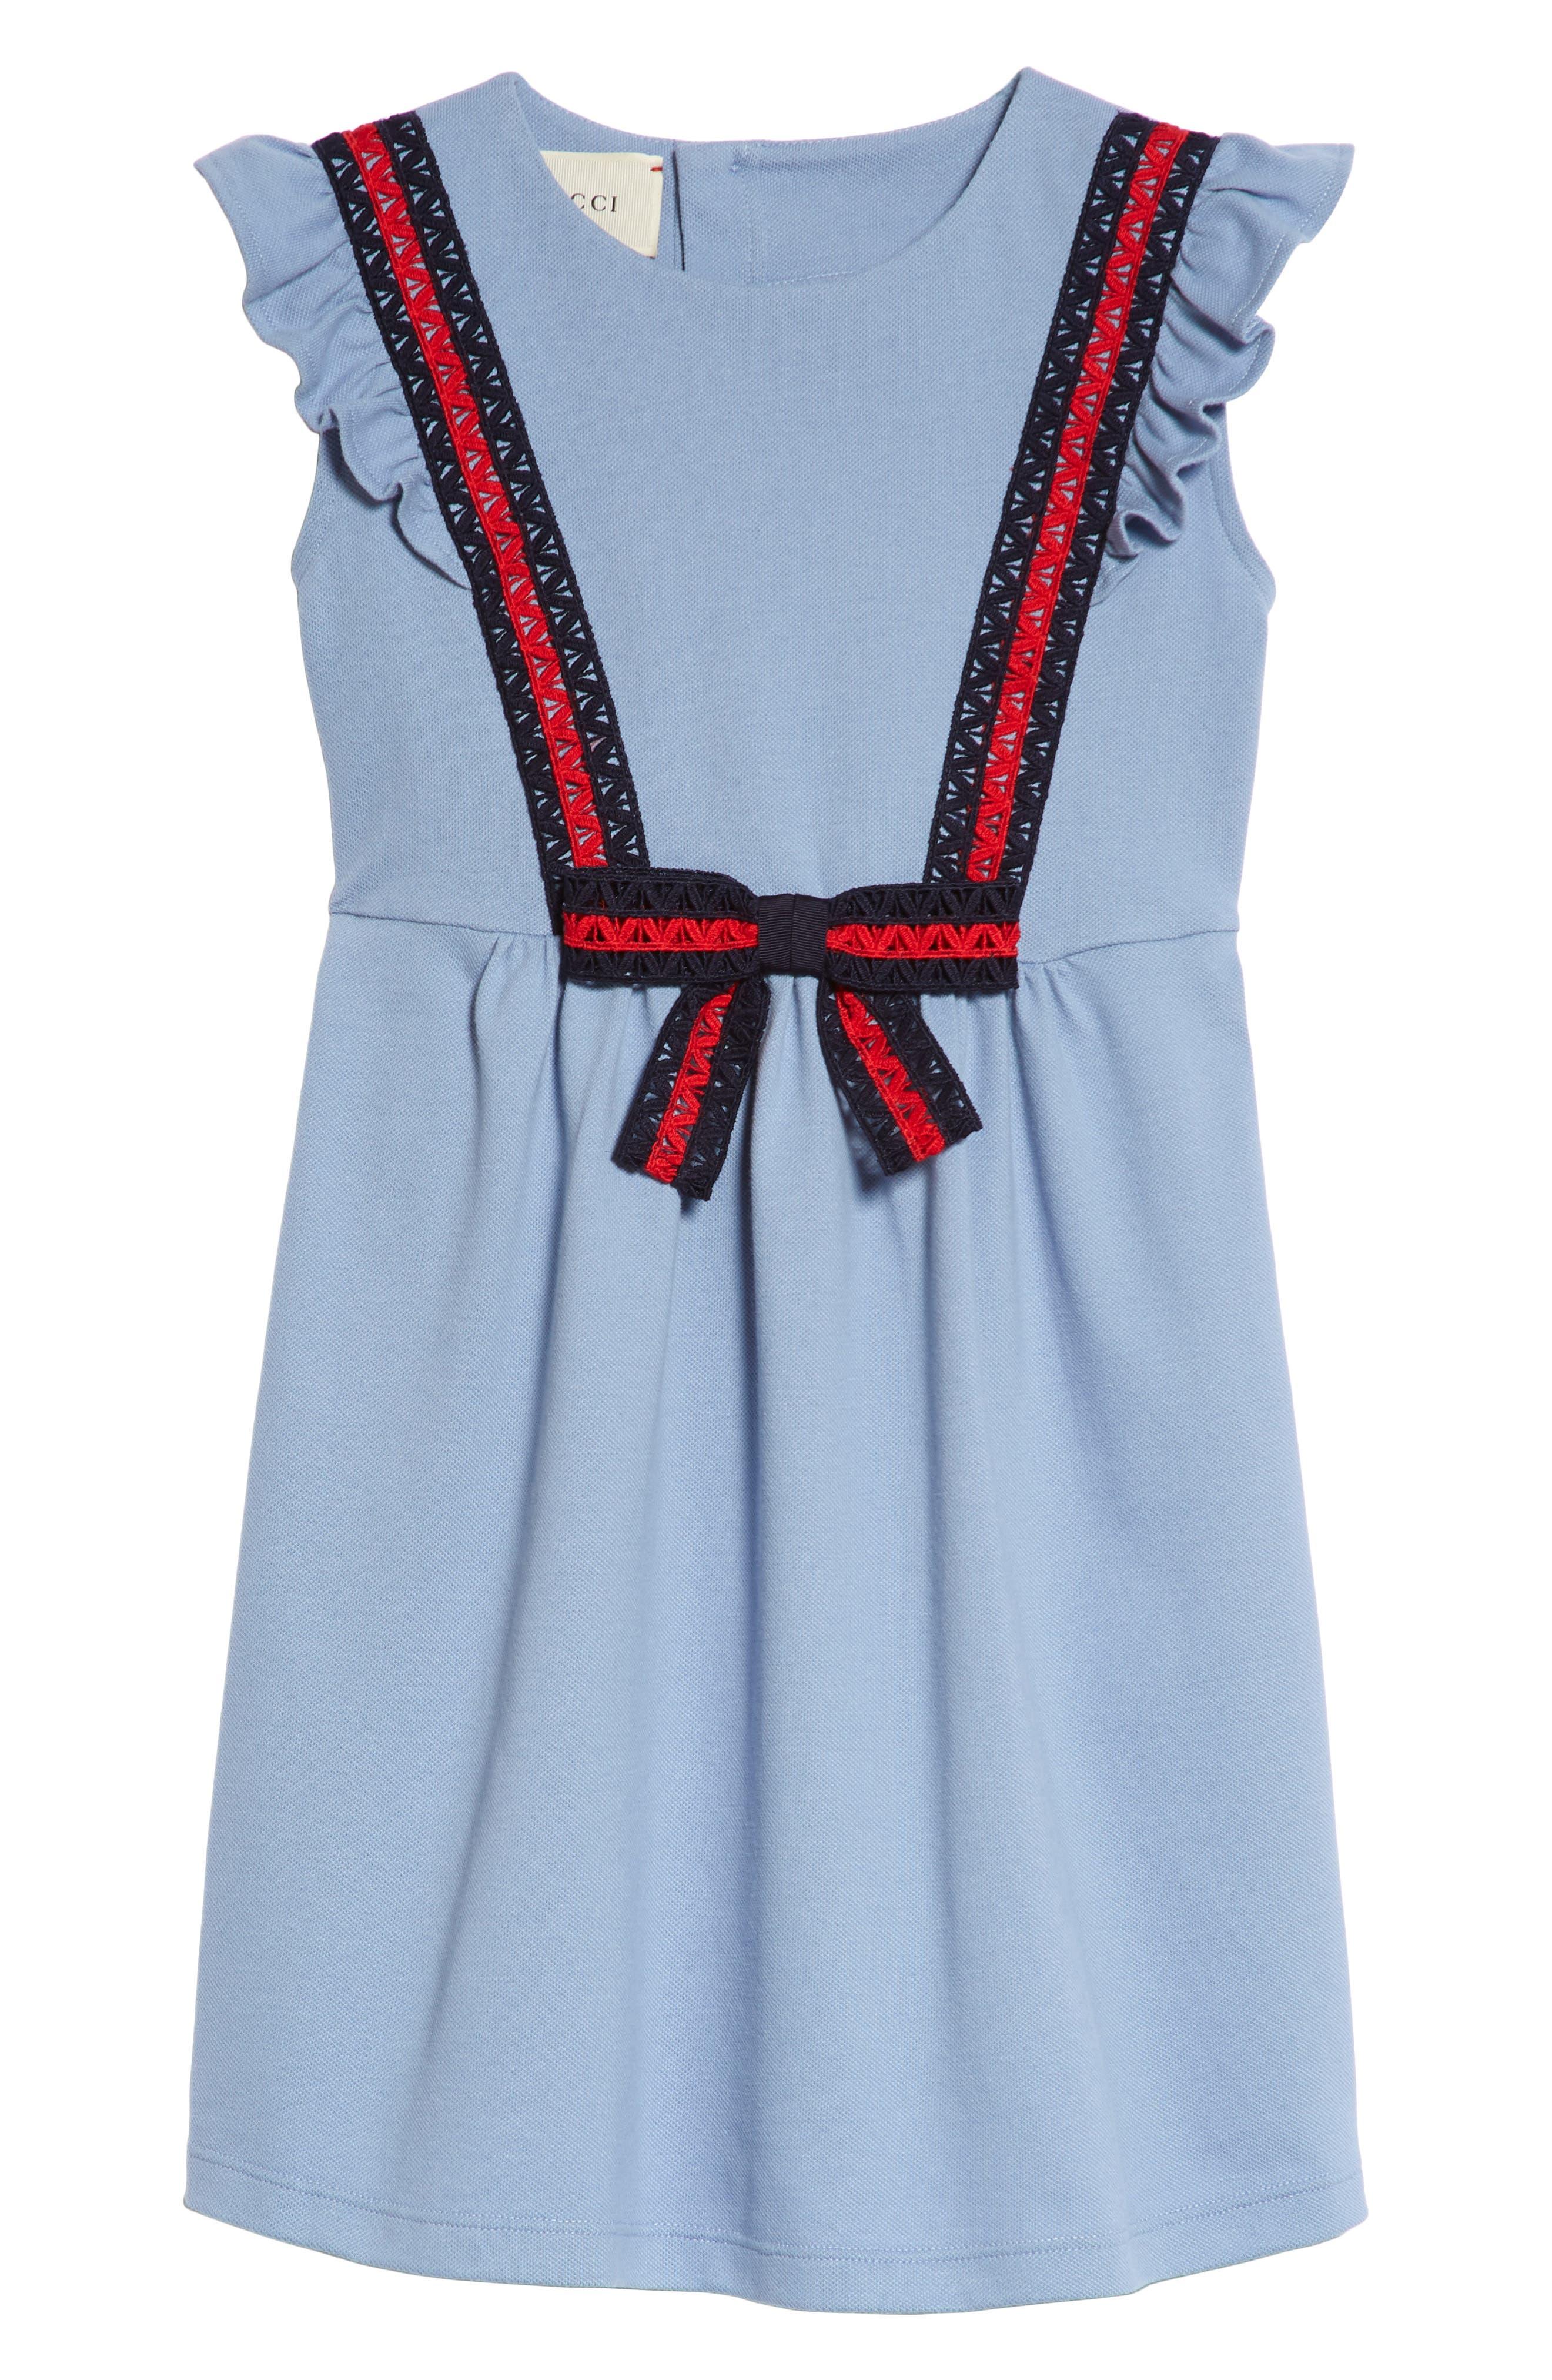 Alternate Image 1 Selected - Gucci Piqué Dress (Little Girls & Big Girls)